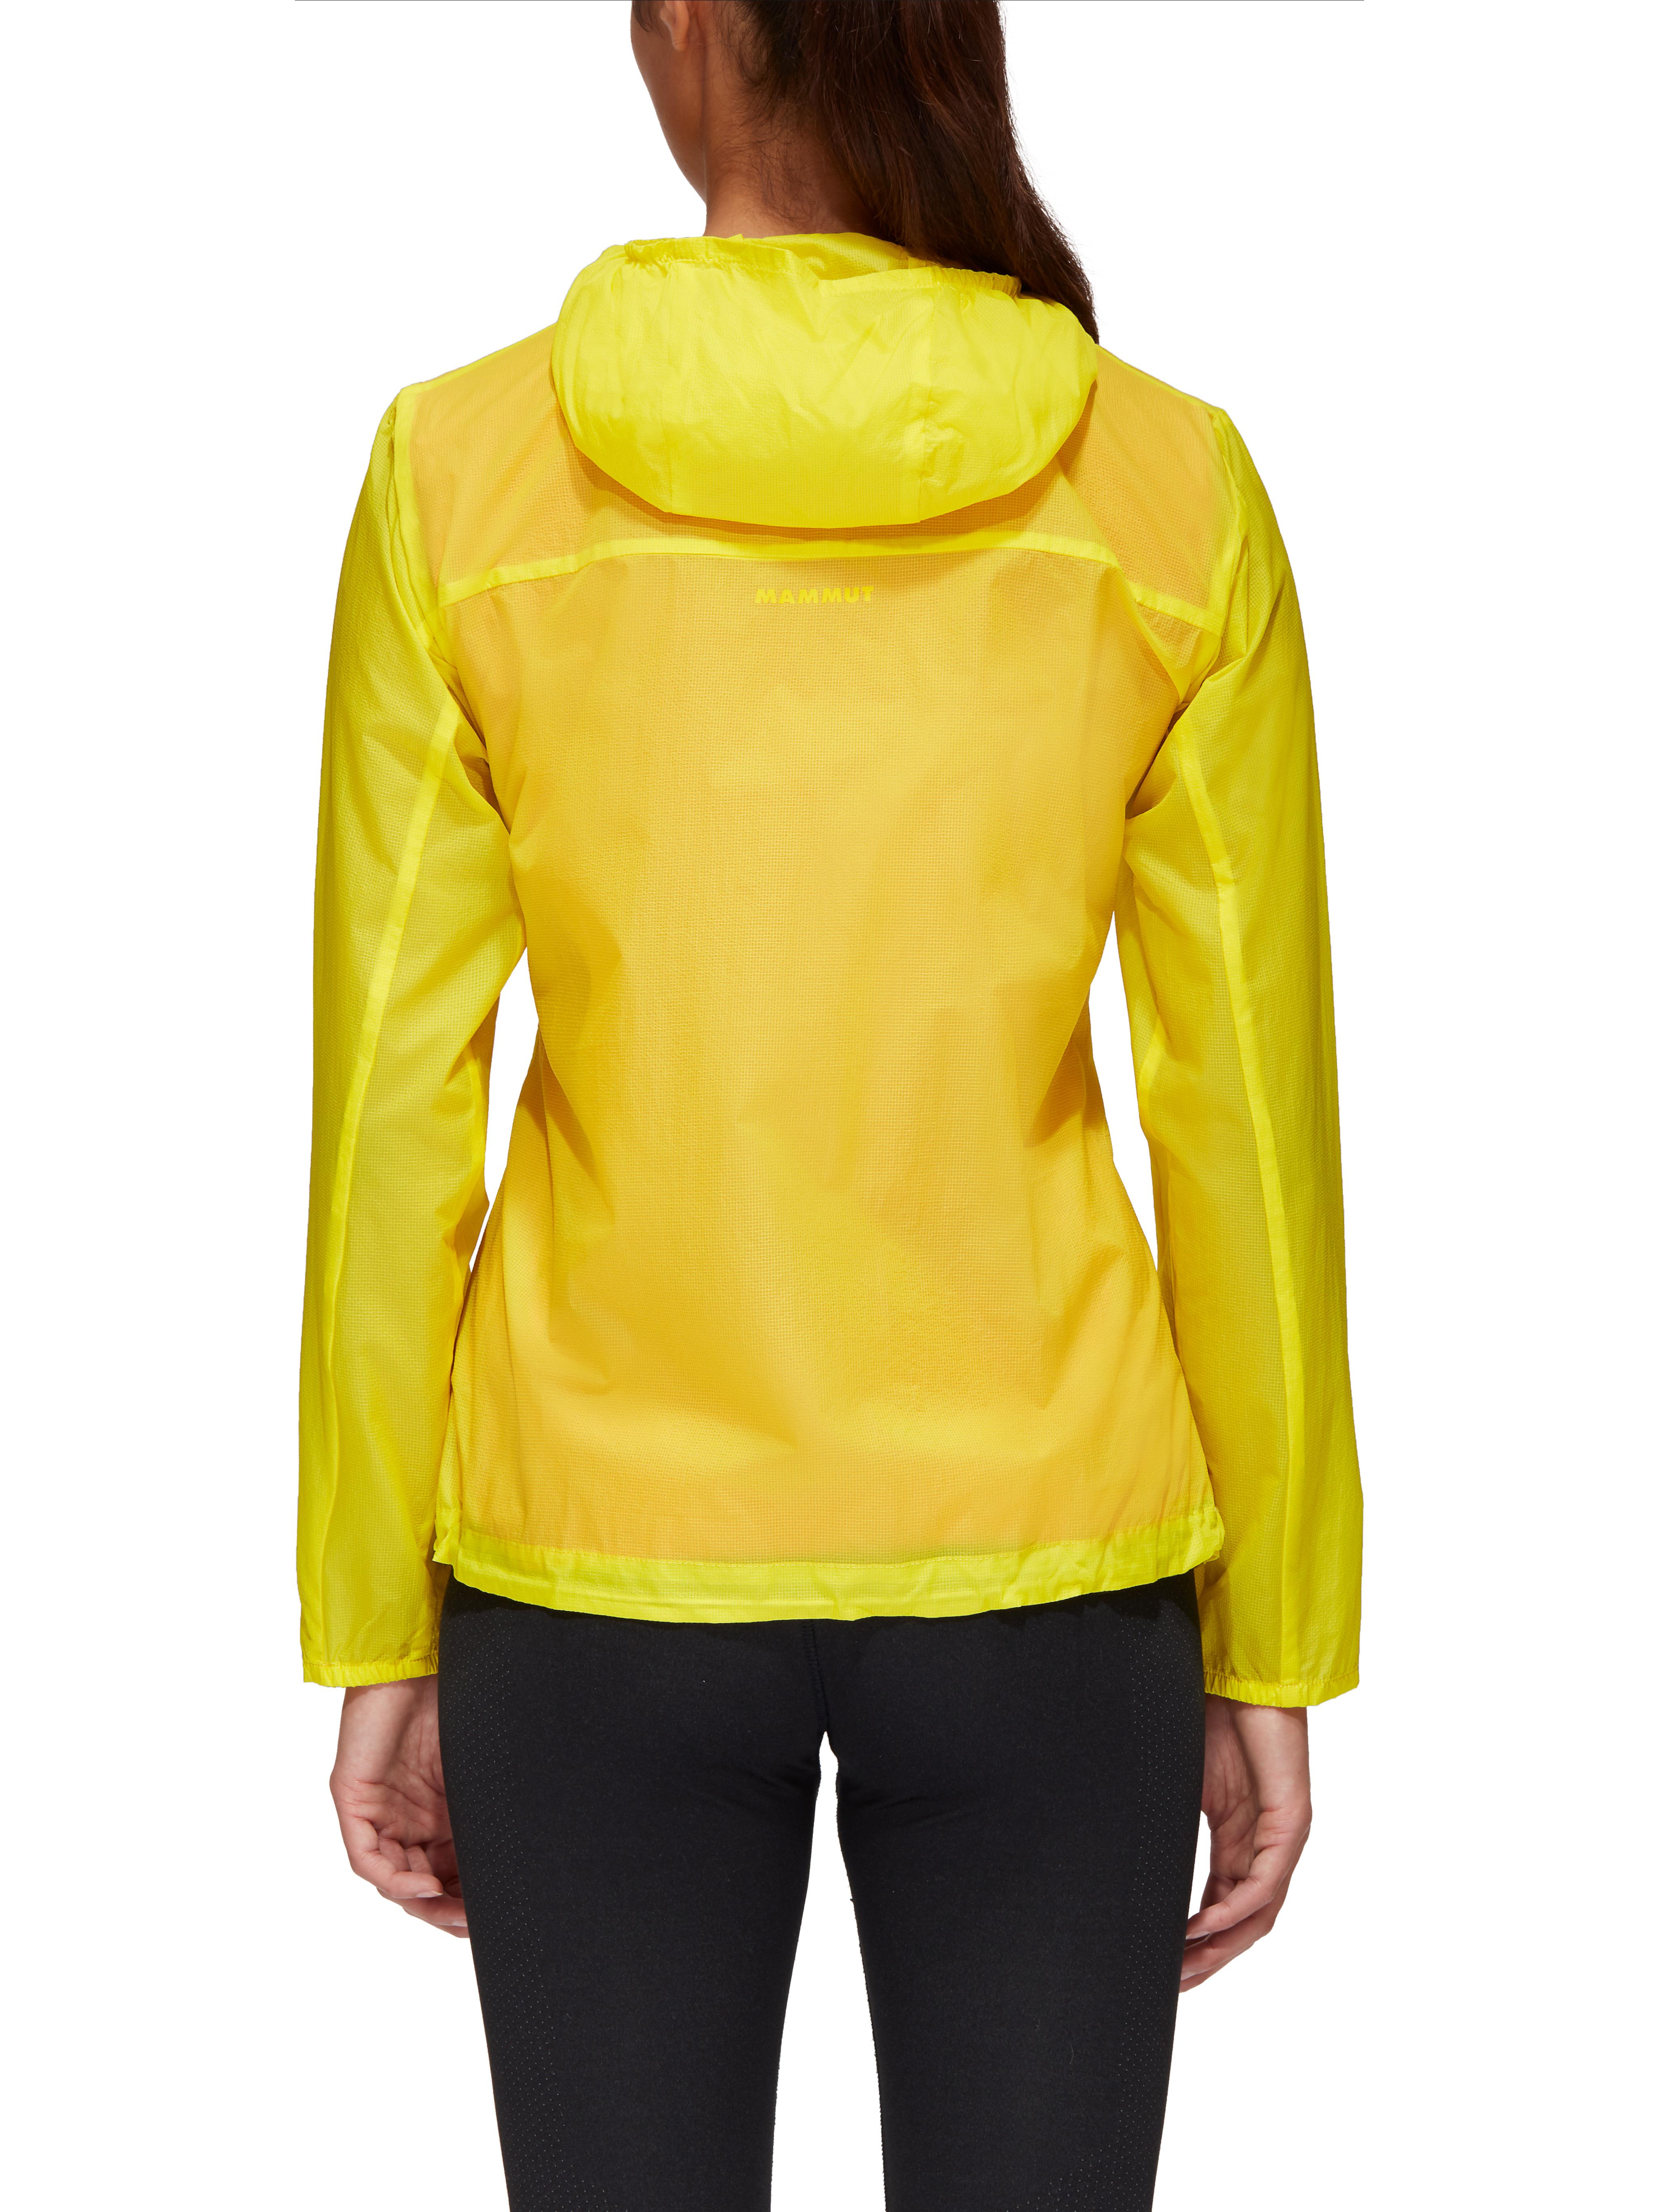 Convey WB Hooded Jacket Women product image